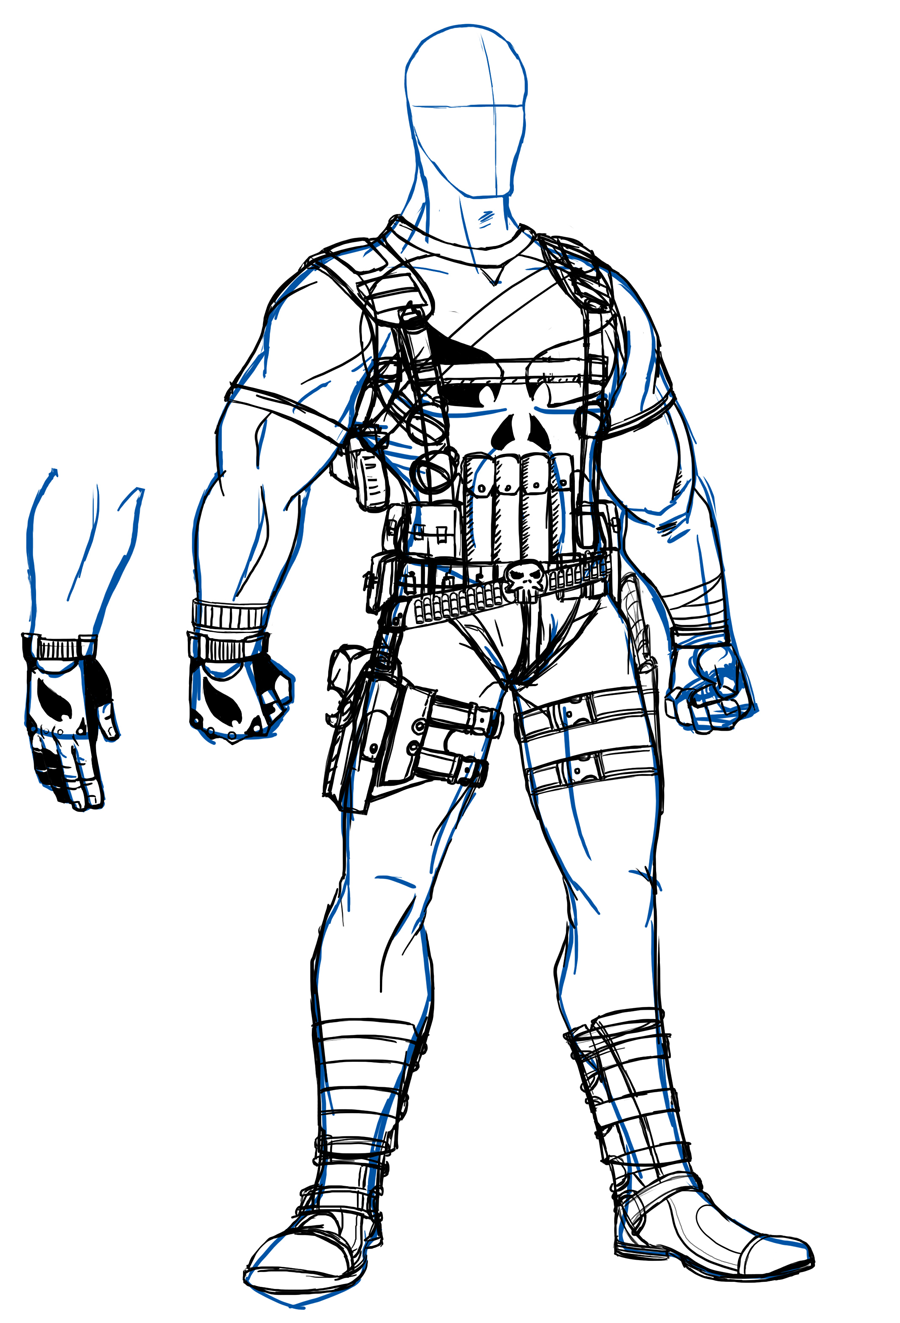 Punisher - Concept